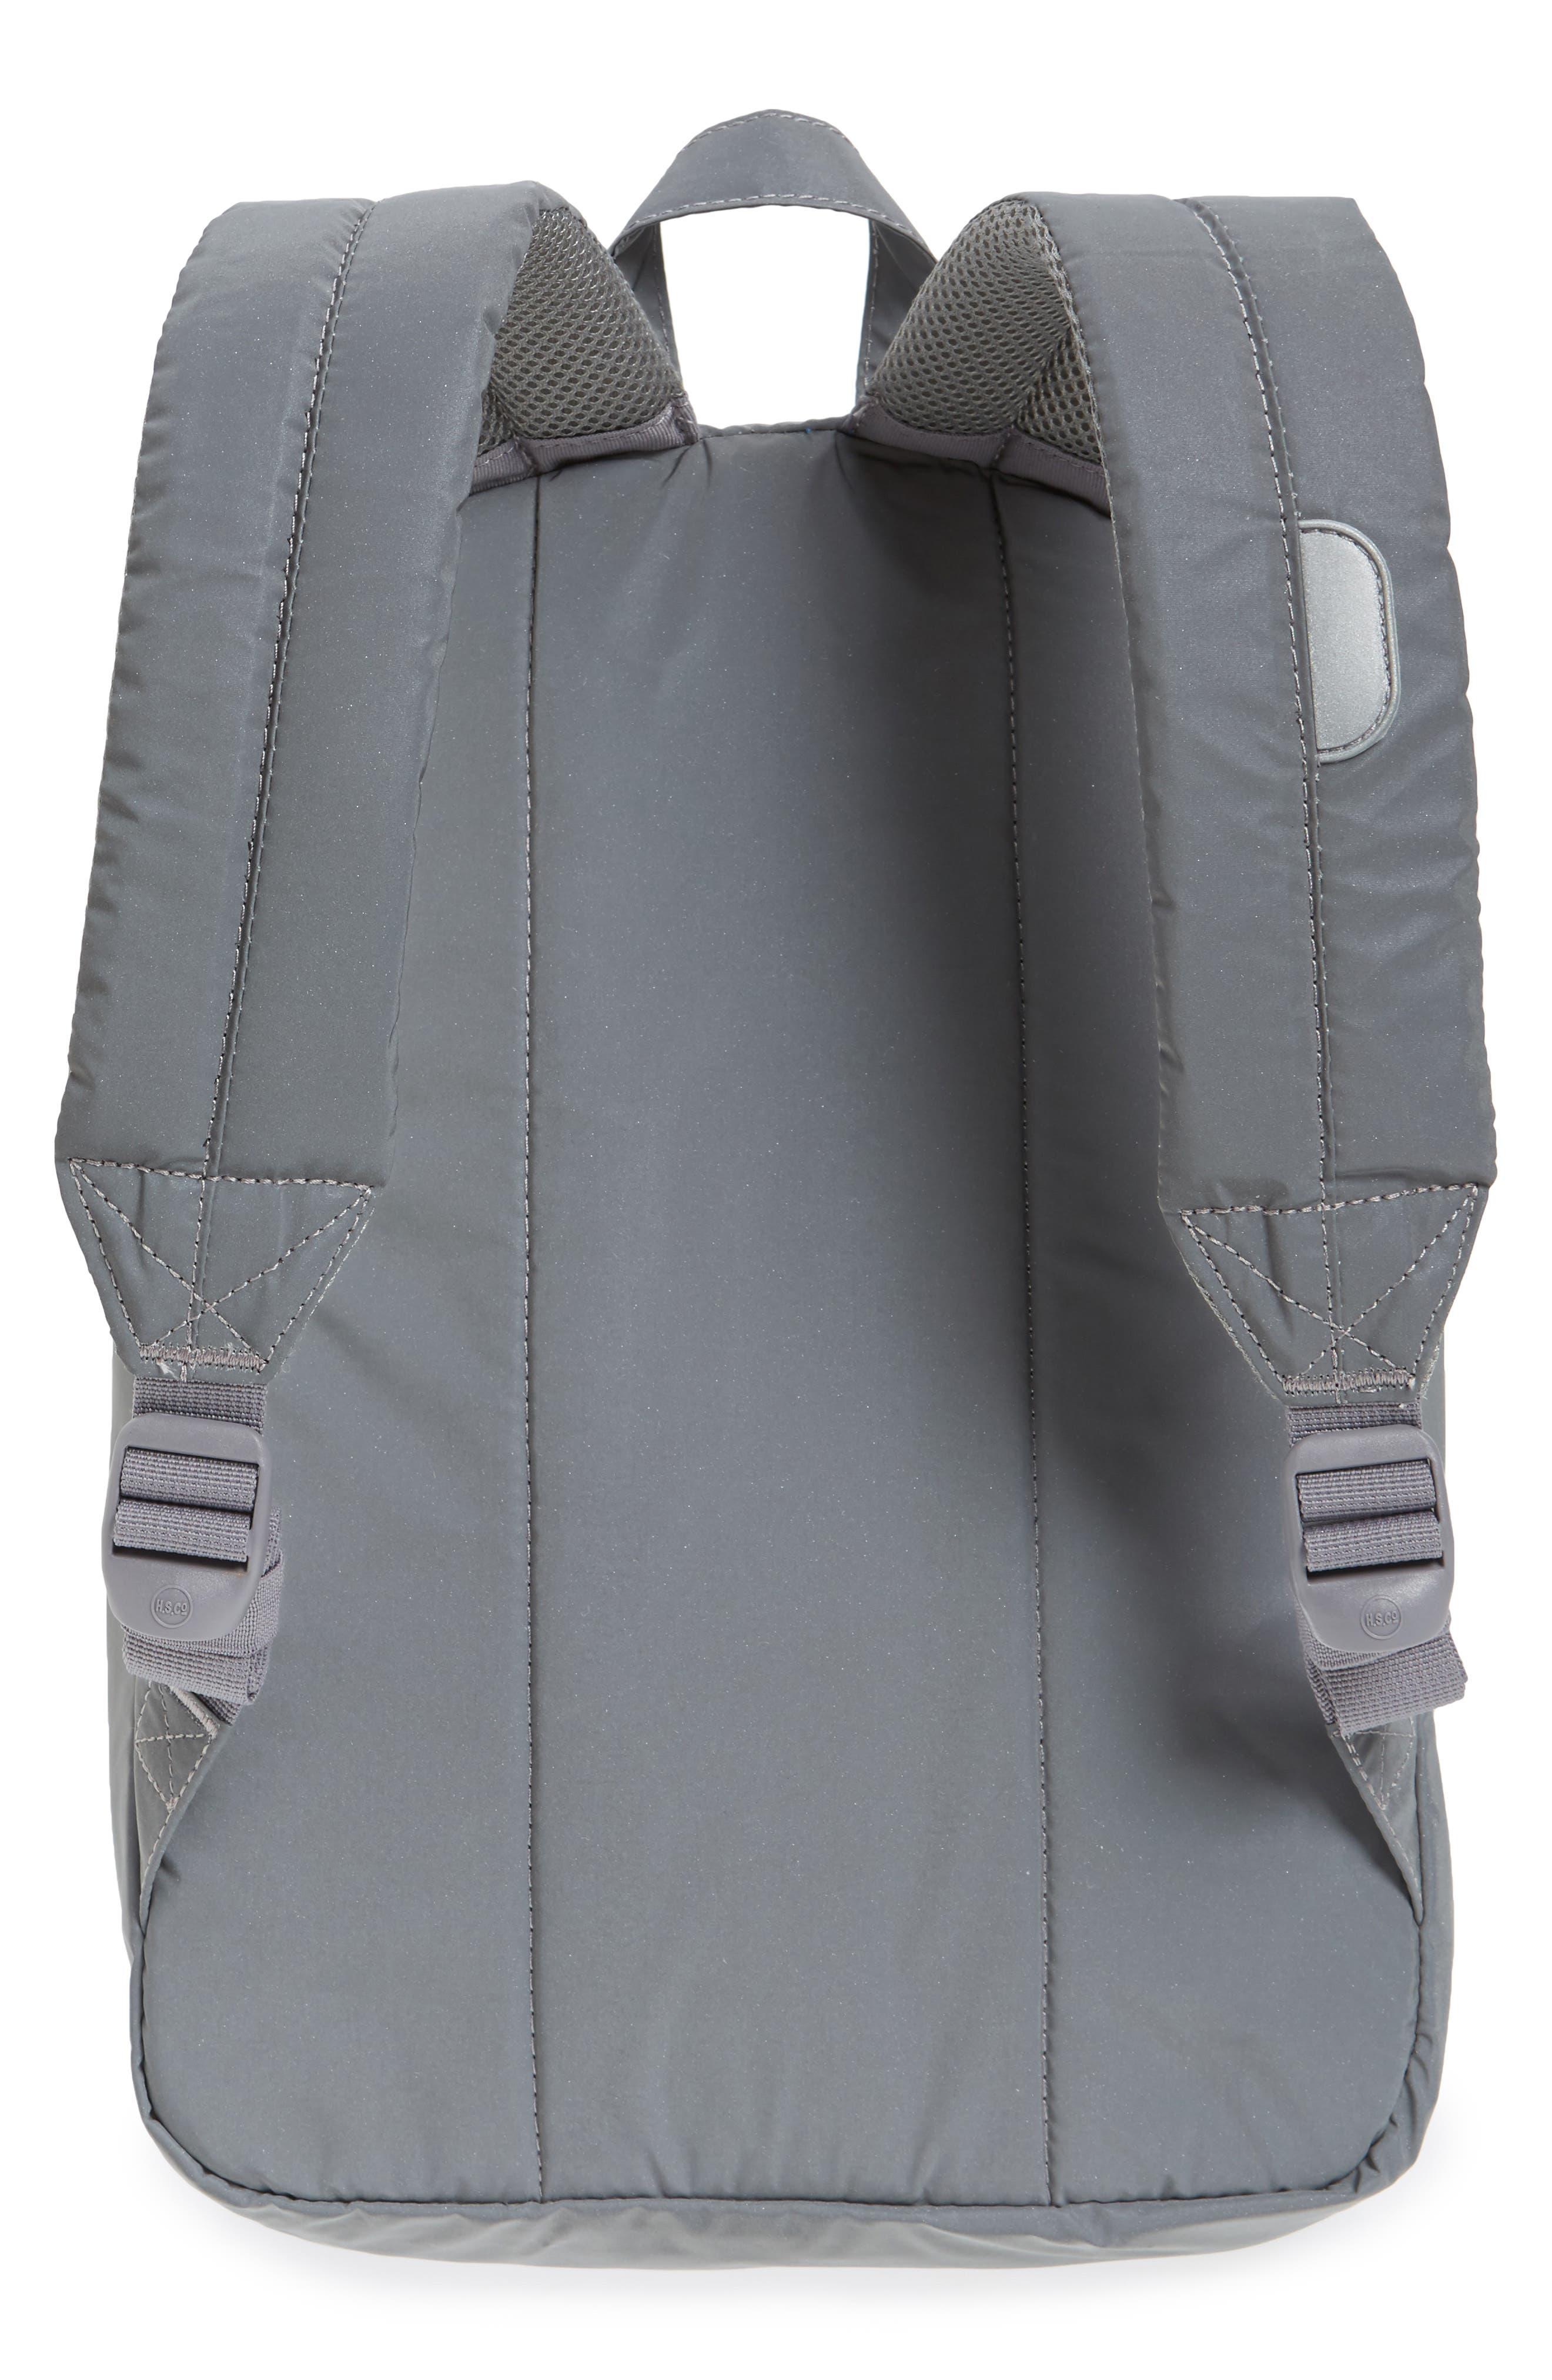 Alternate Image 2  - Herschel Supply Co. Heritage Reflective Backpack (Kids)